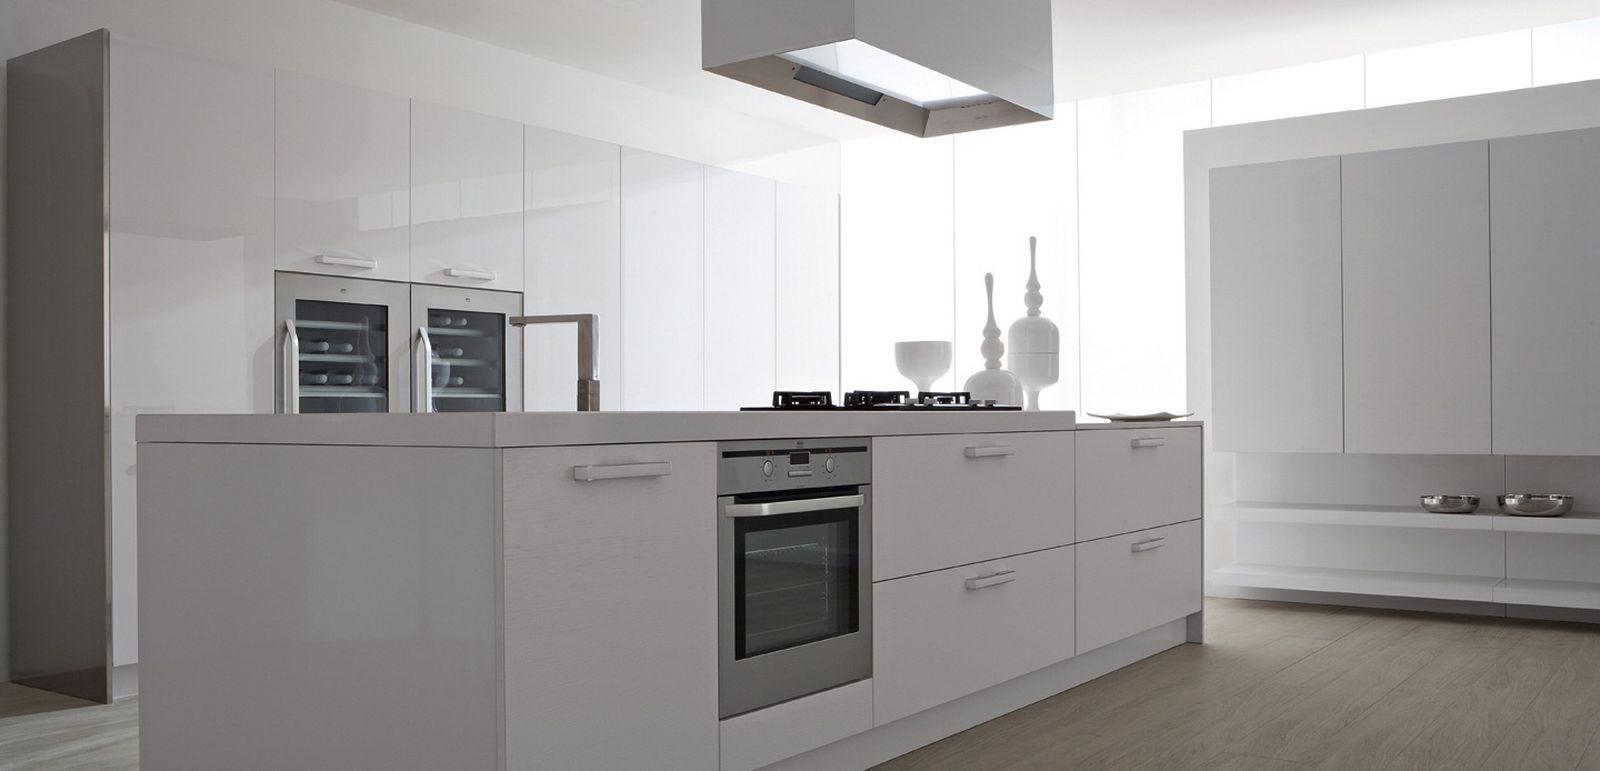 Lacquer Kitchen Cabinets Amazing Modern Pin Modern Kitchen White Lacquer Cabinets On Pin White Modern Kitchen Contemporary Kitchen Island Modern Kitchen Island